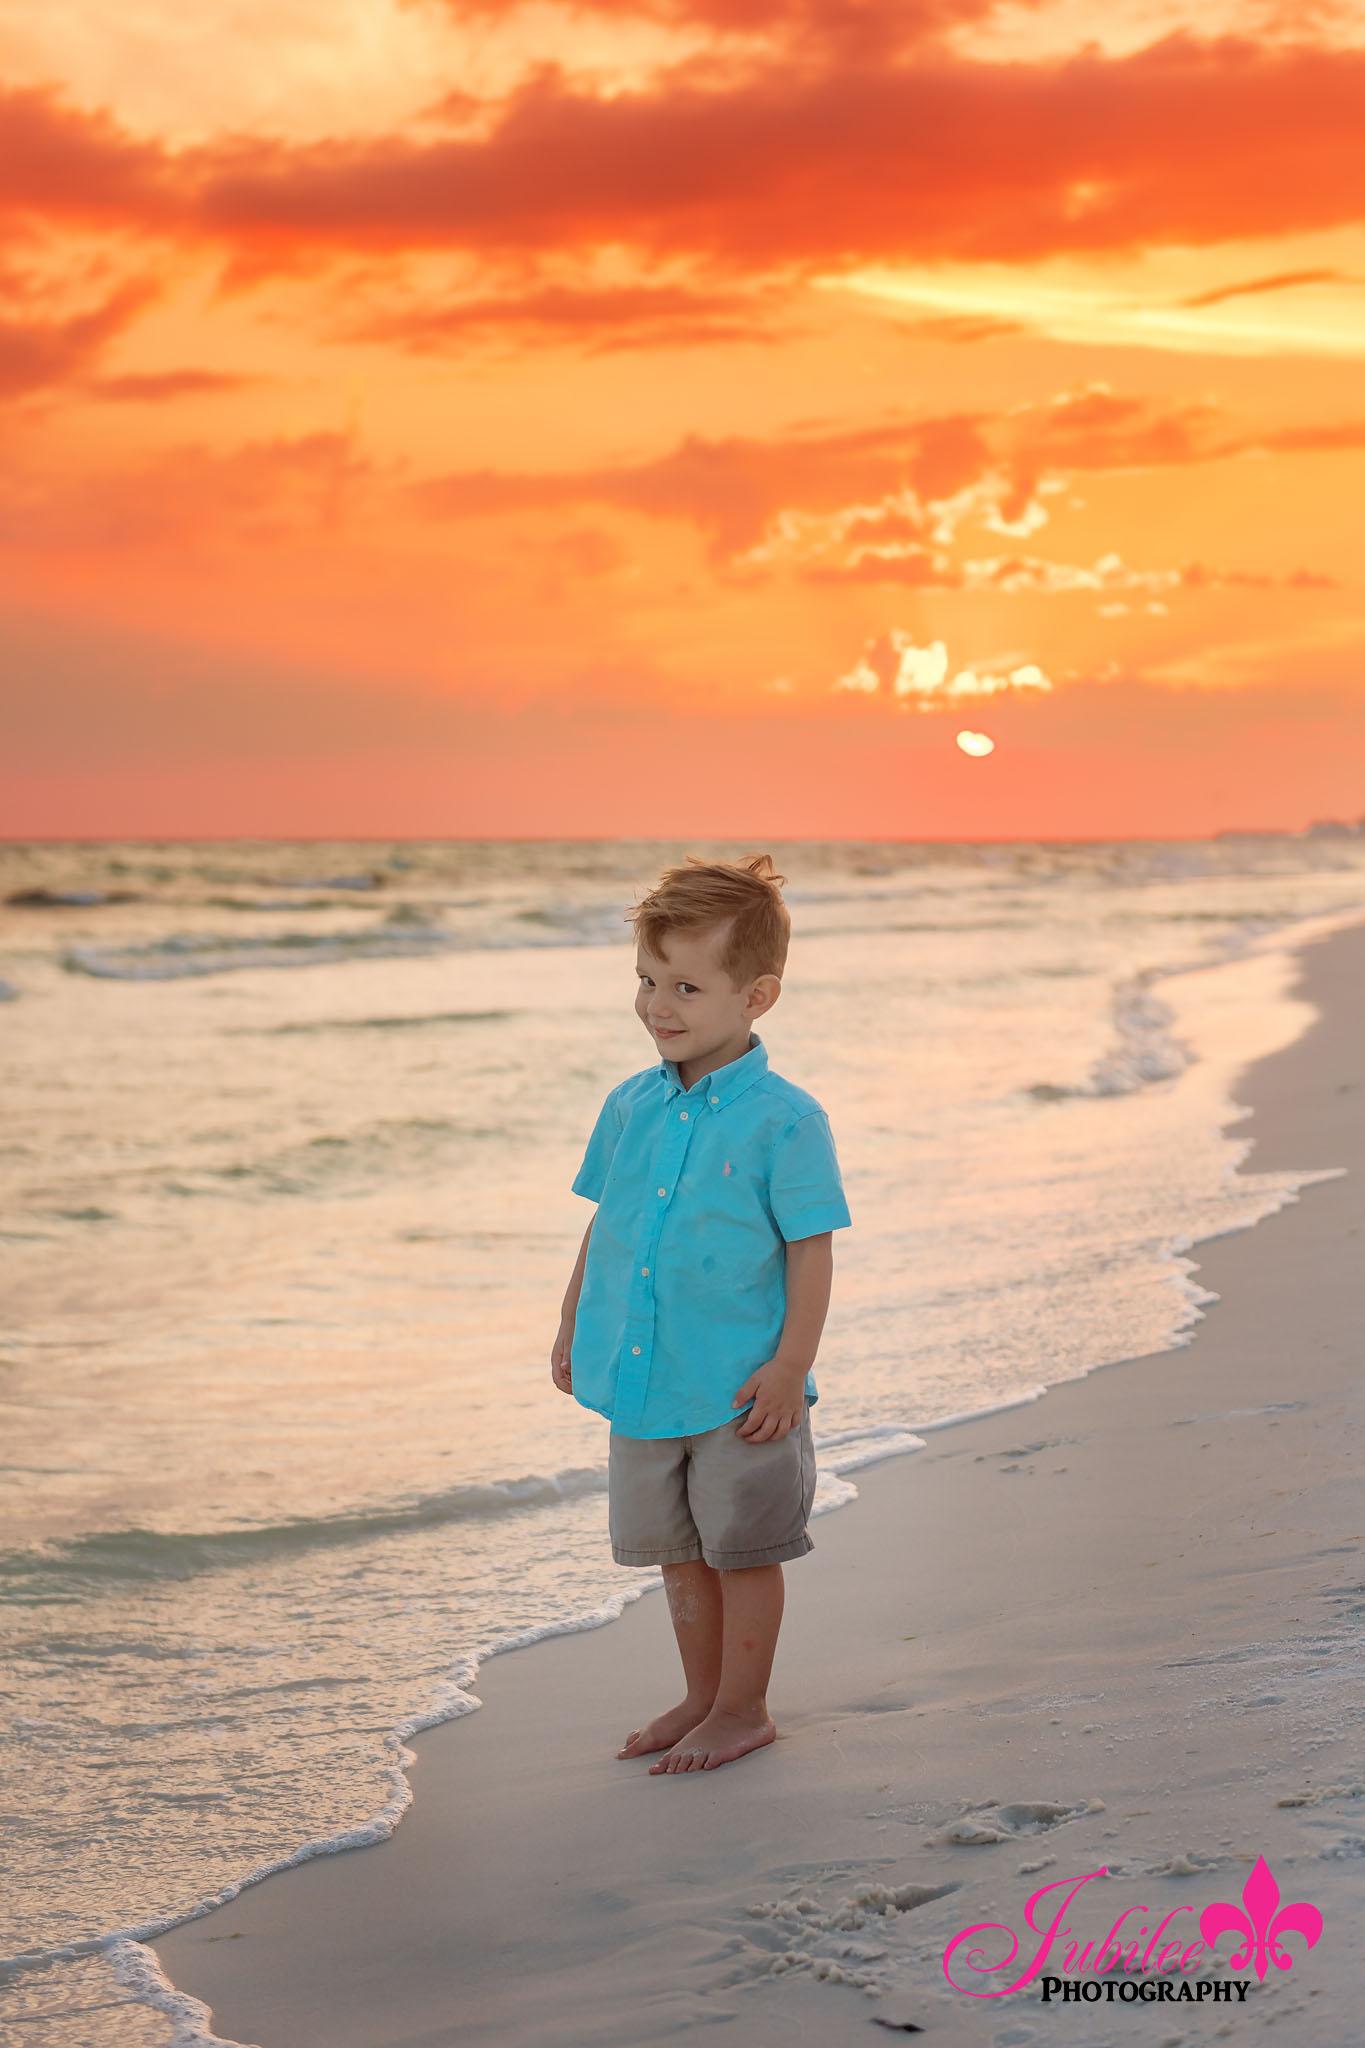 destin_beach_photographer_615